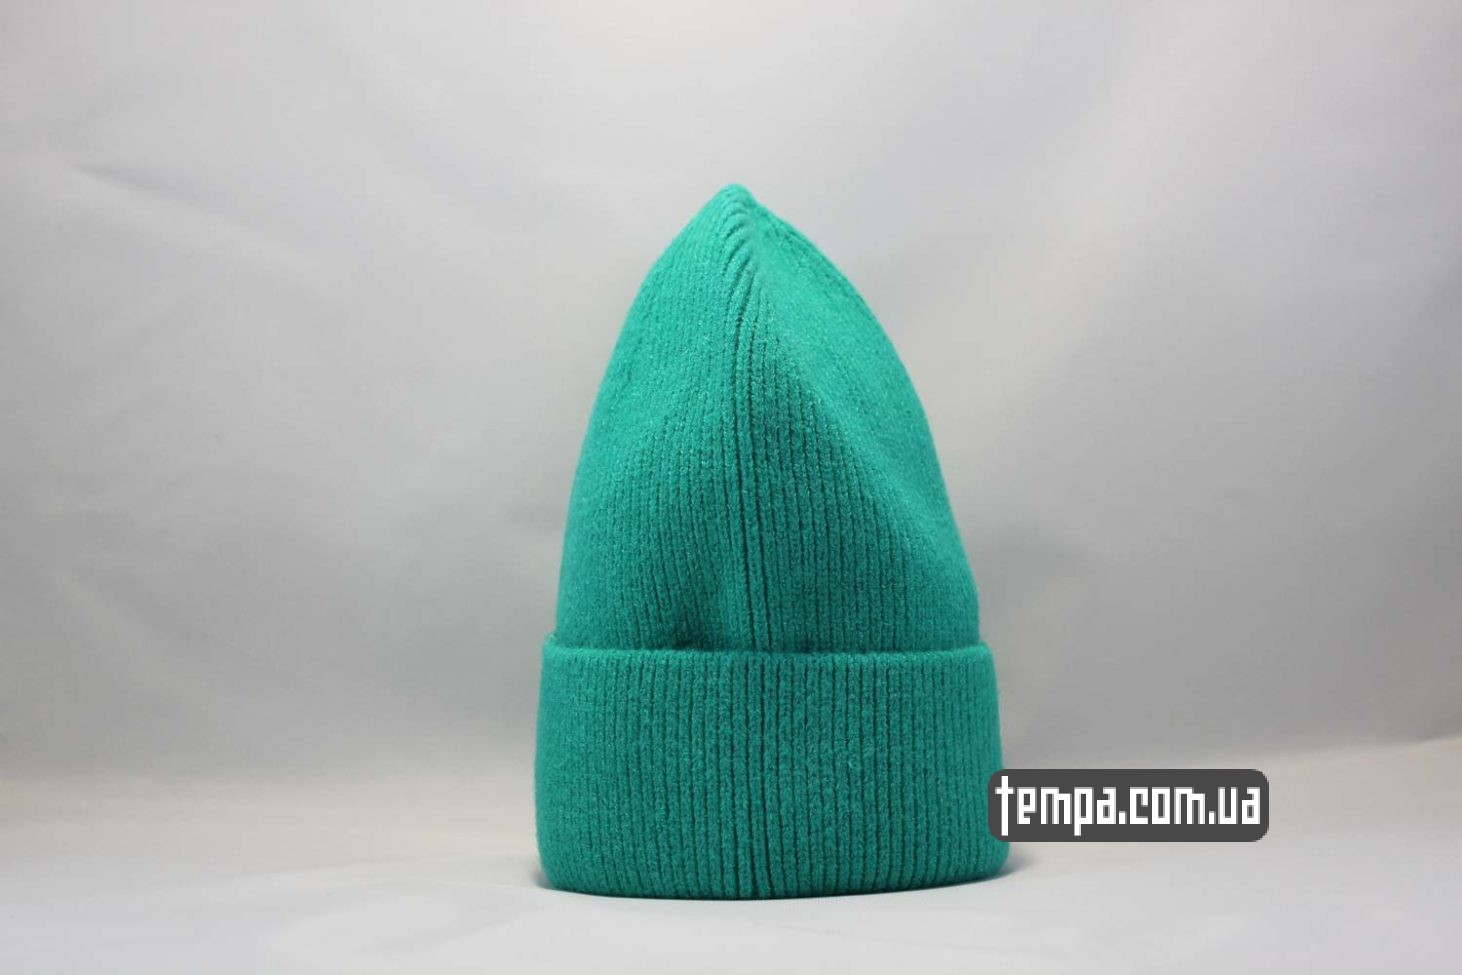 тепля зимняя шапка beanie Champion green зеленая купить Украина